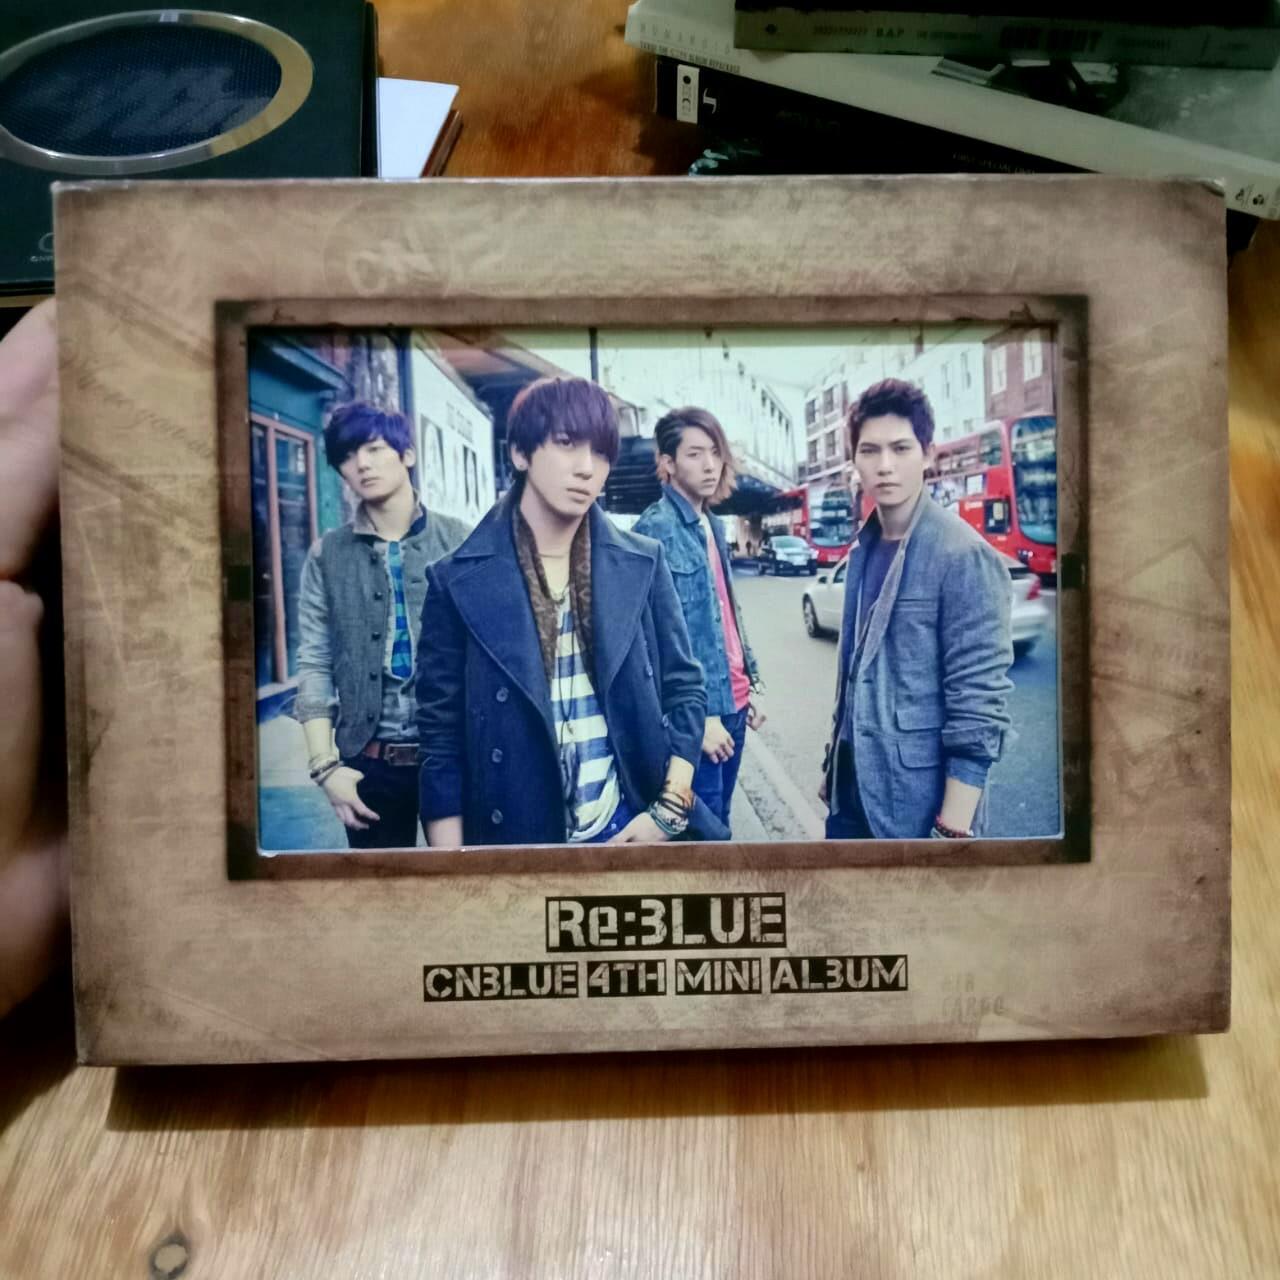 [KPOP ALBUM PRELOVED] CNBLUE - RE:BLUE (4TH MINI ALBUM) | ORIGINAL IMPORT FROM SOUTH KOREA